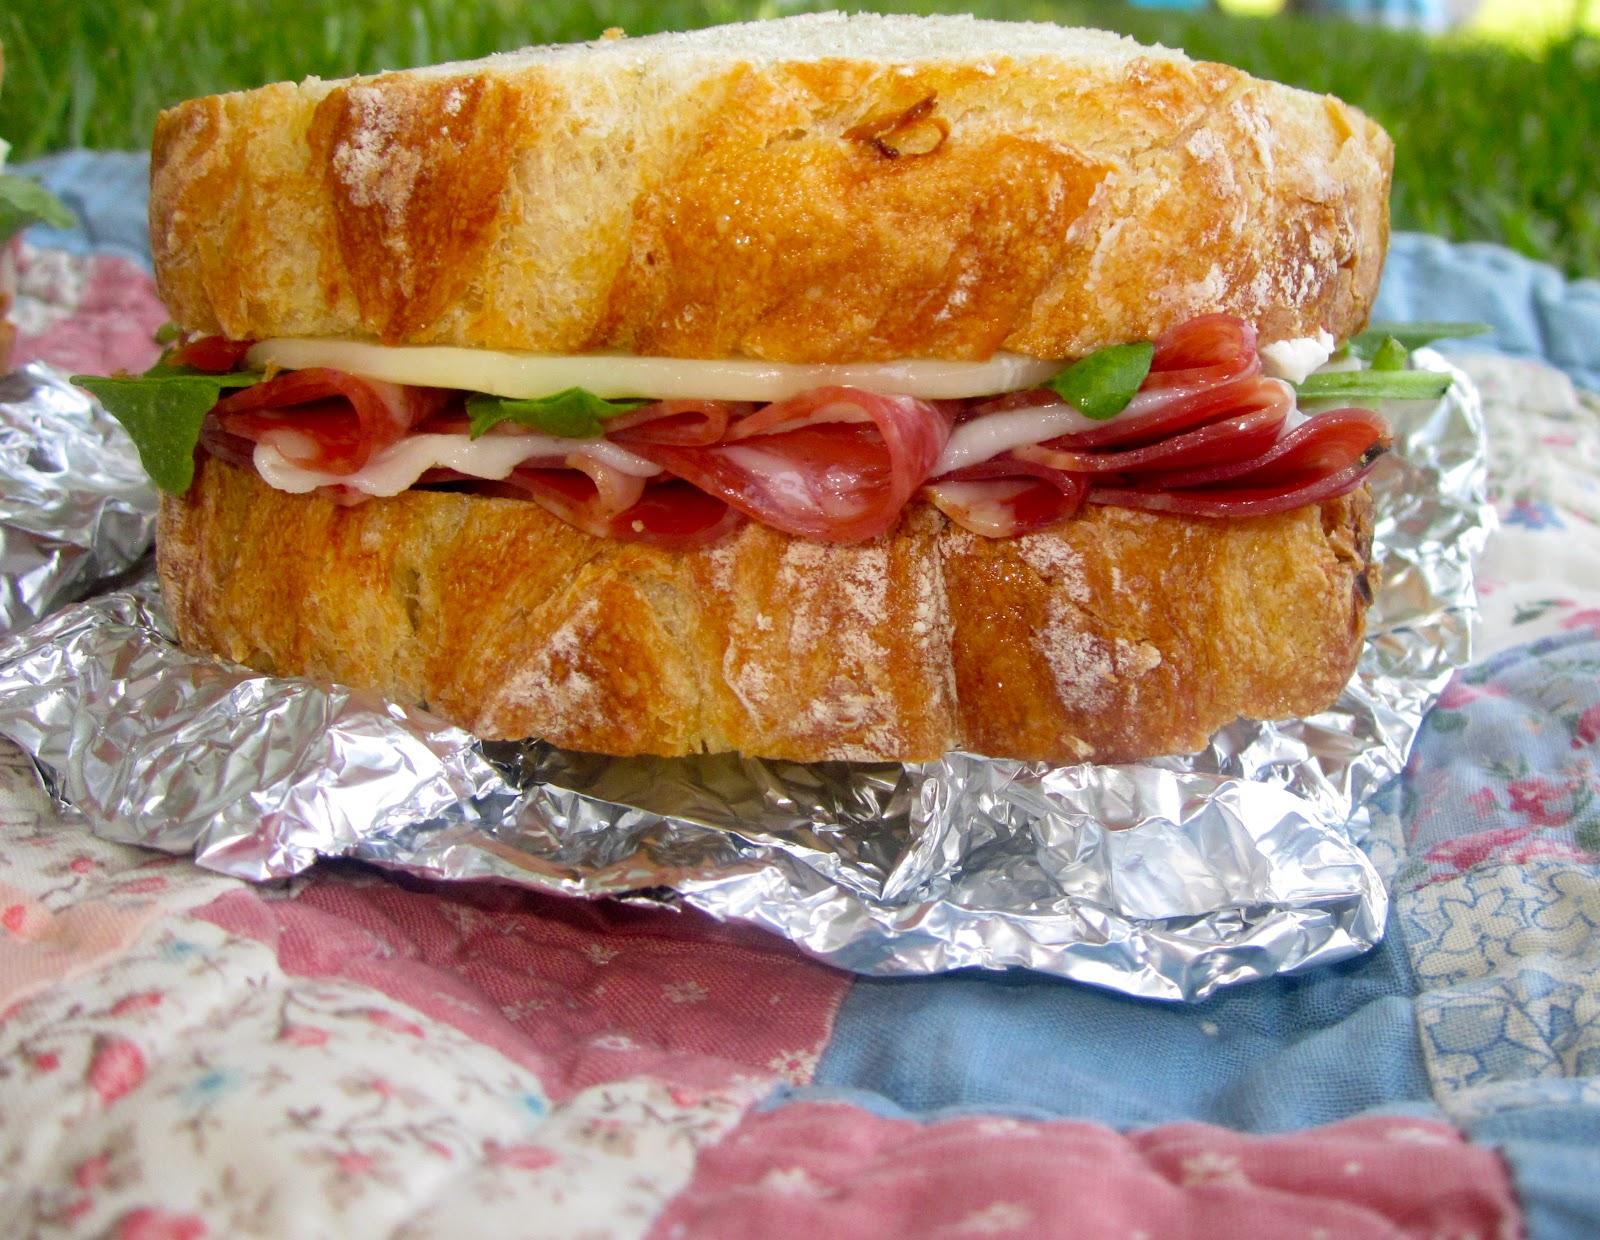 Italian Sub Sandwiches